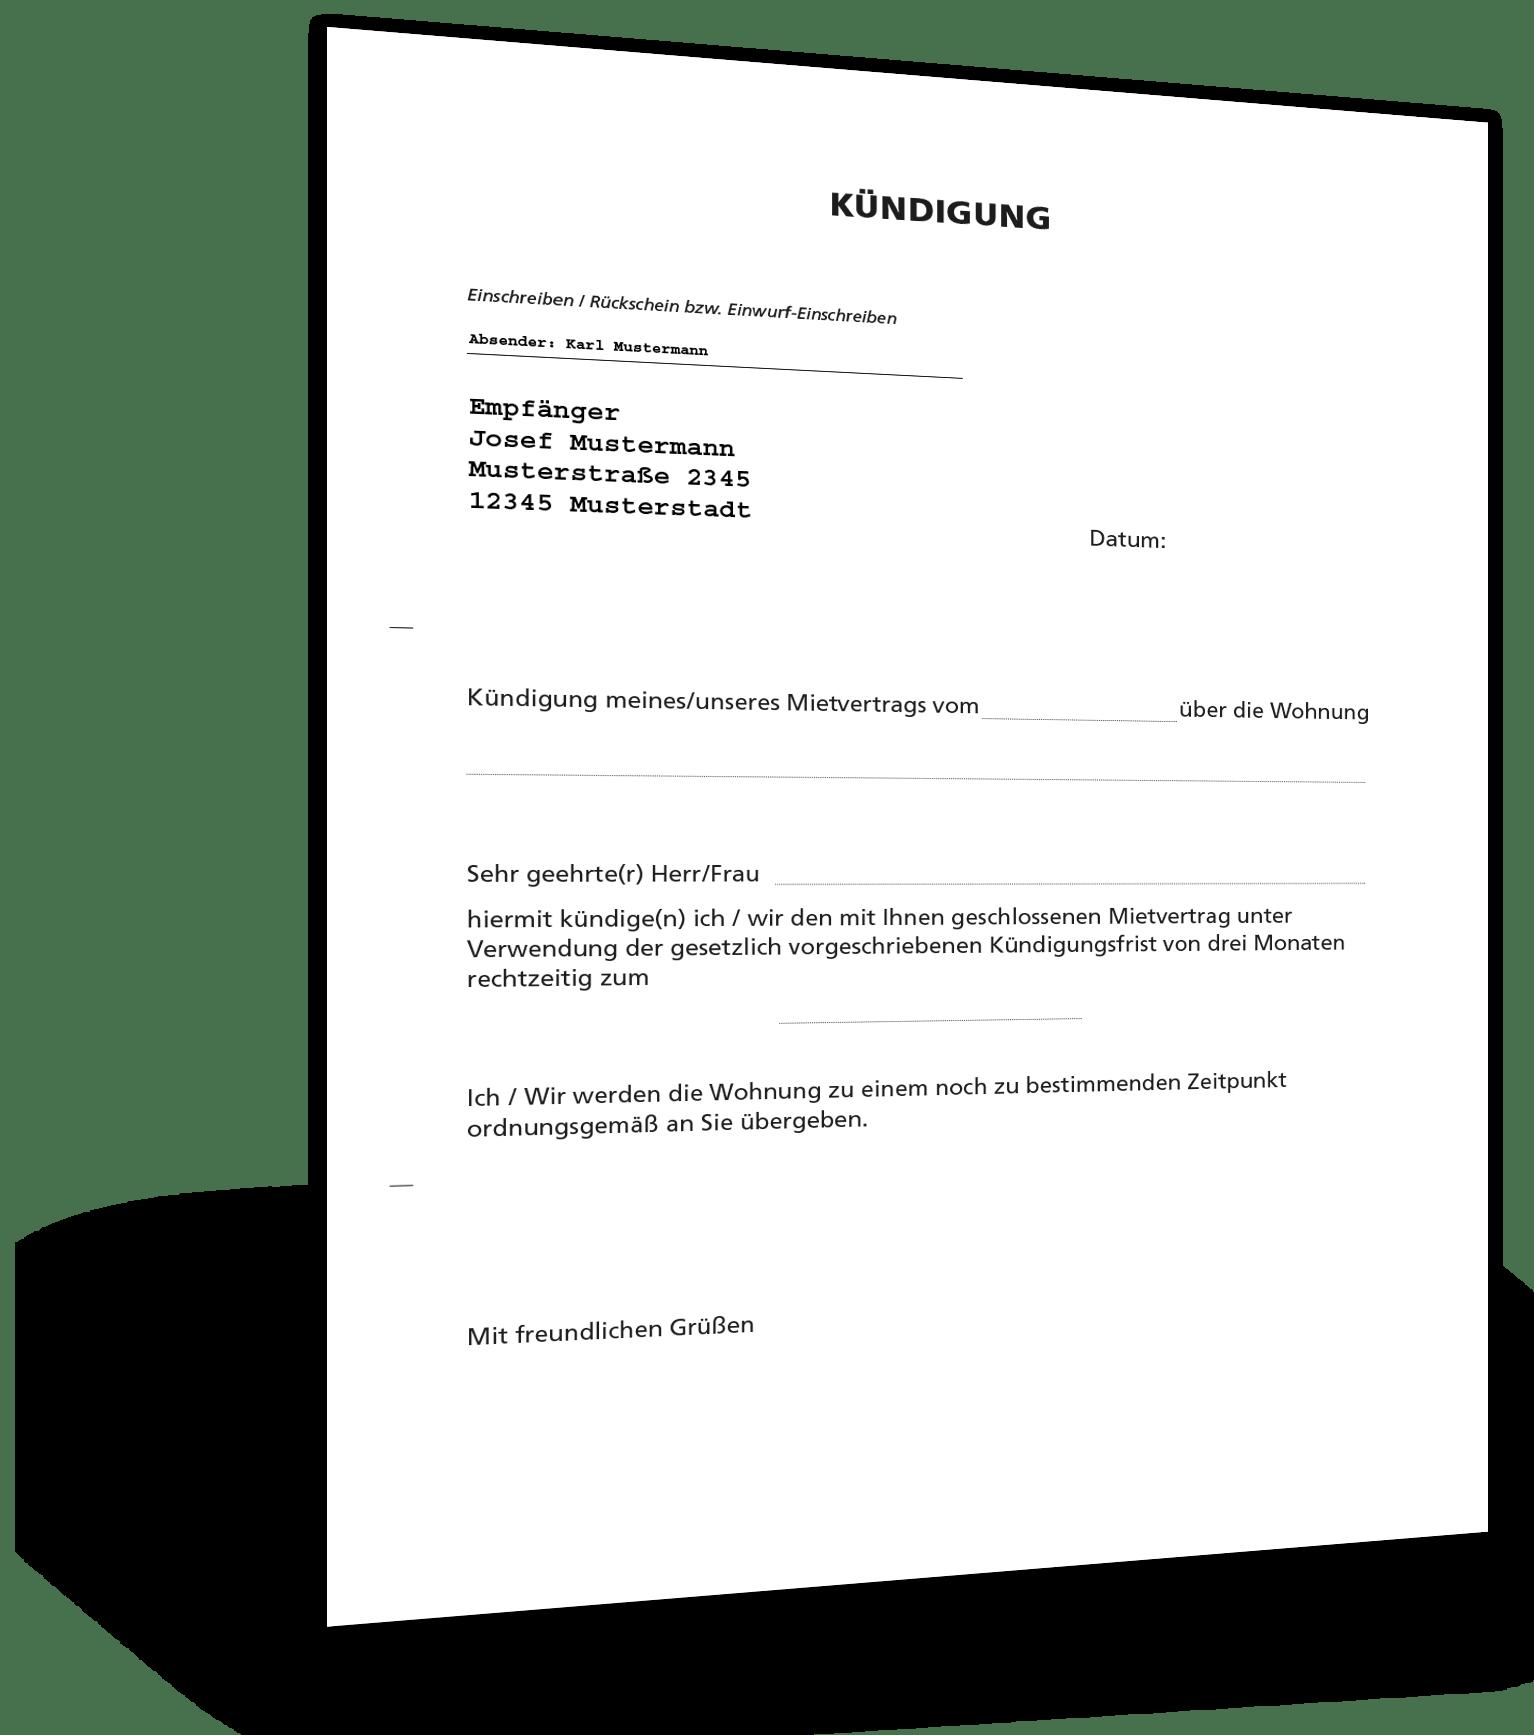 Kundigung Mietvertrag Musterbrief Kebut